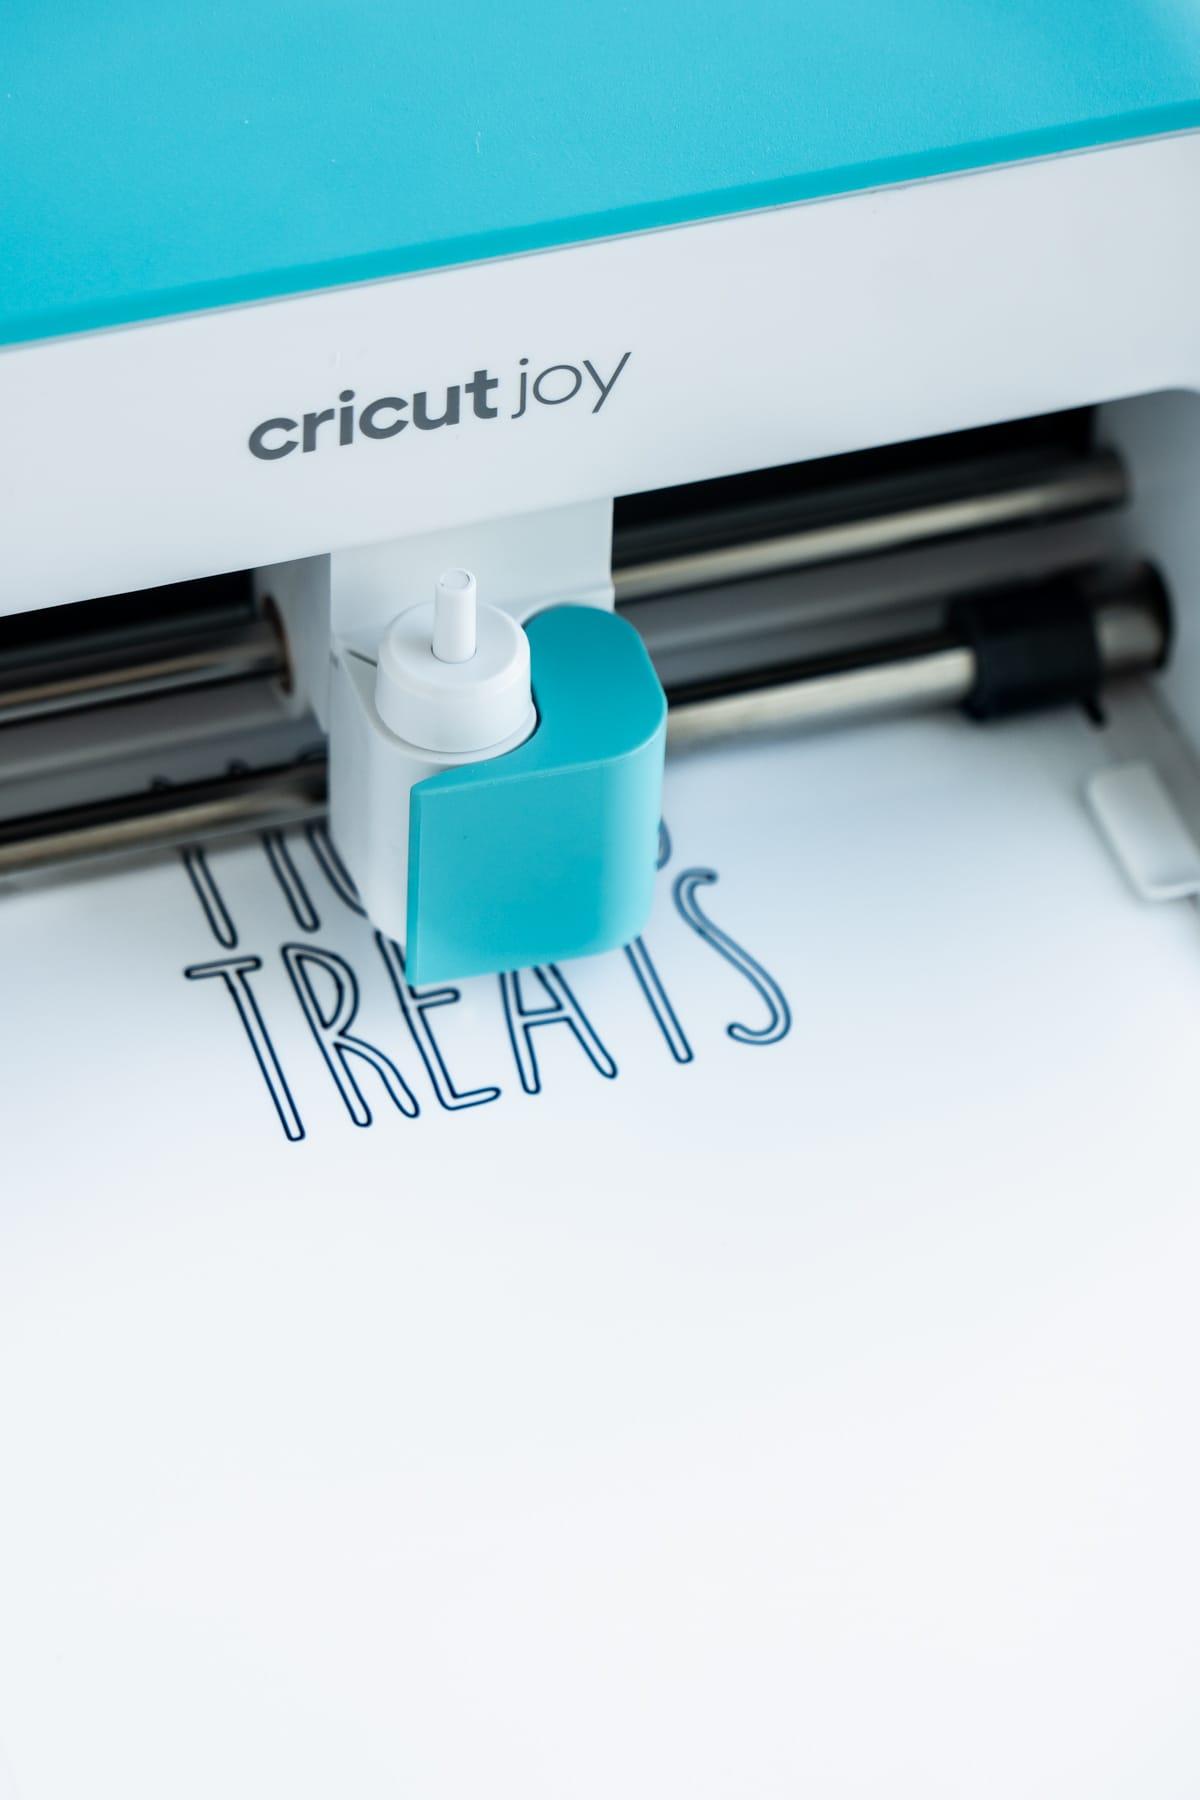 Cricut Joy writing on a label